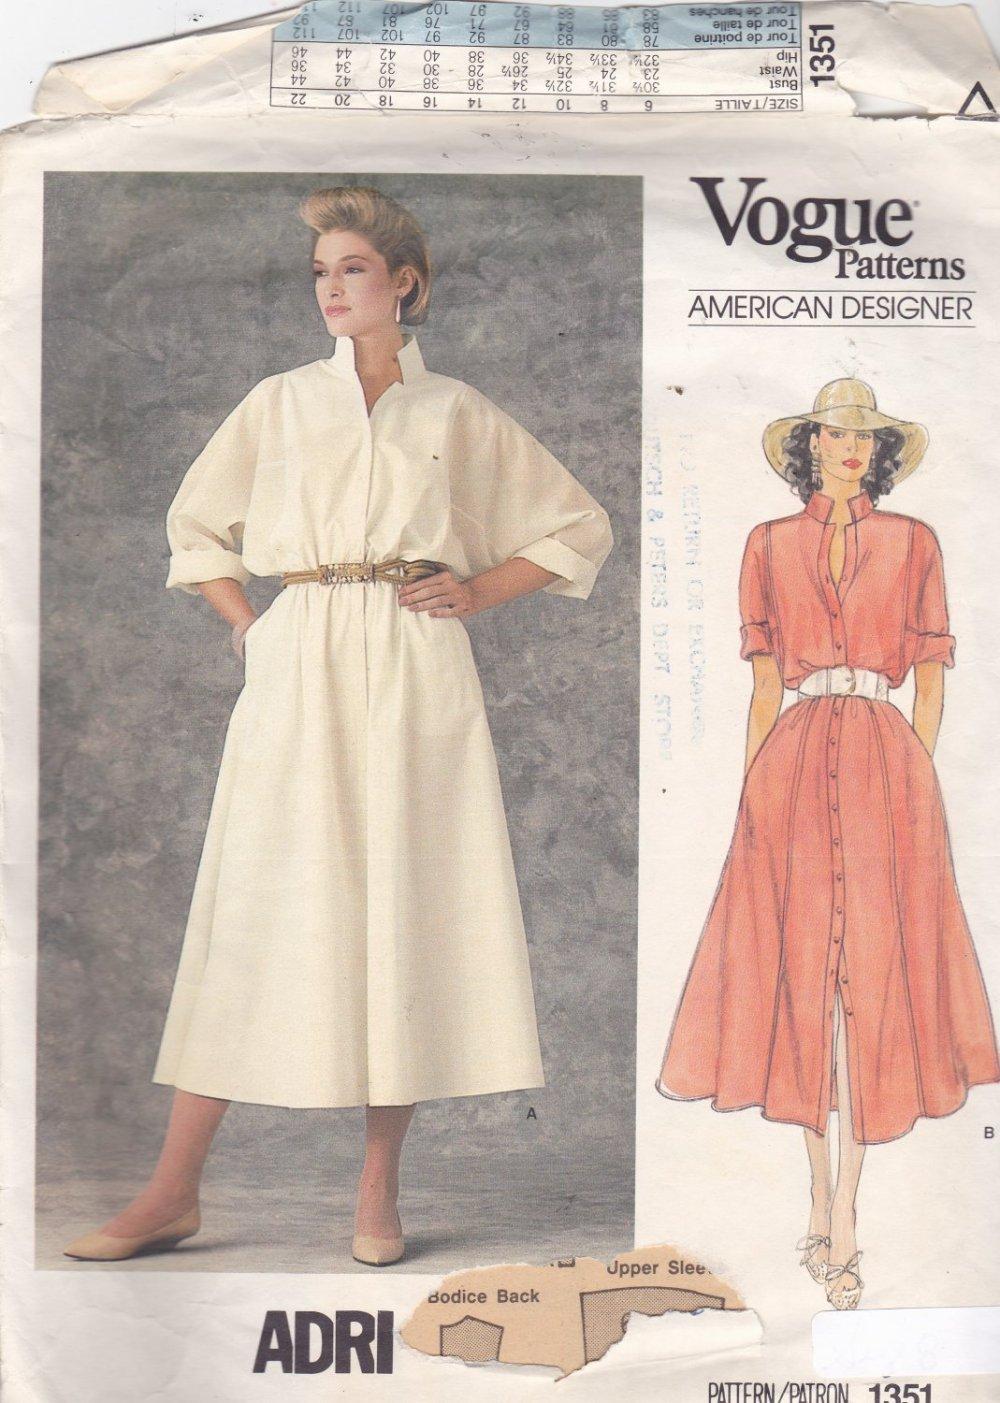 Vogue 1351 Pattern 8 Uncut Designer ADRI Shirtwaist Dress Loose Fit Modest